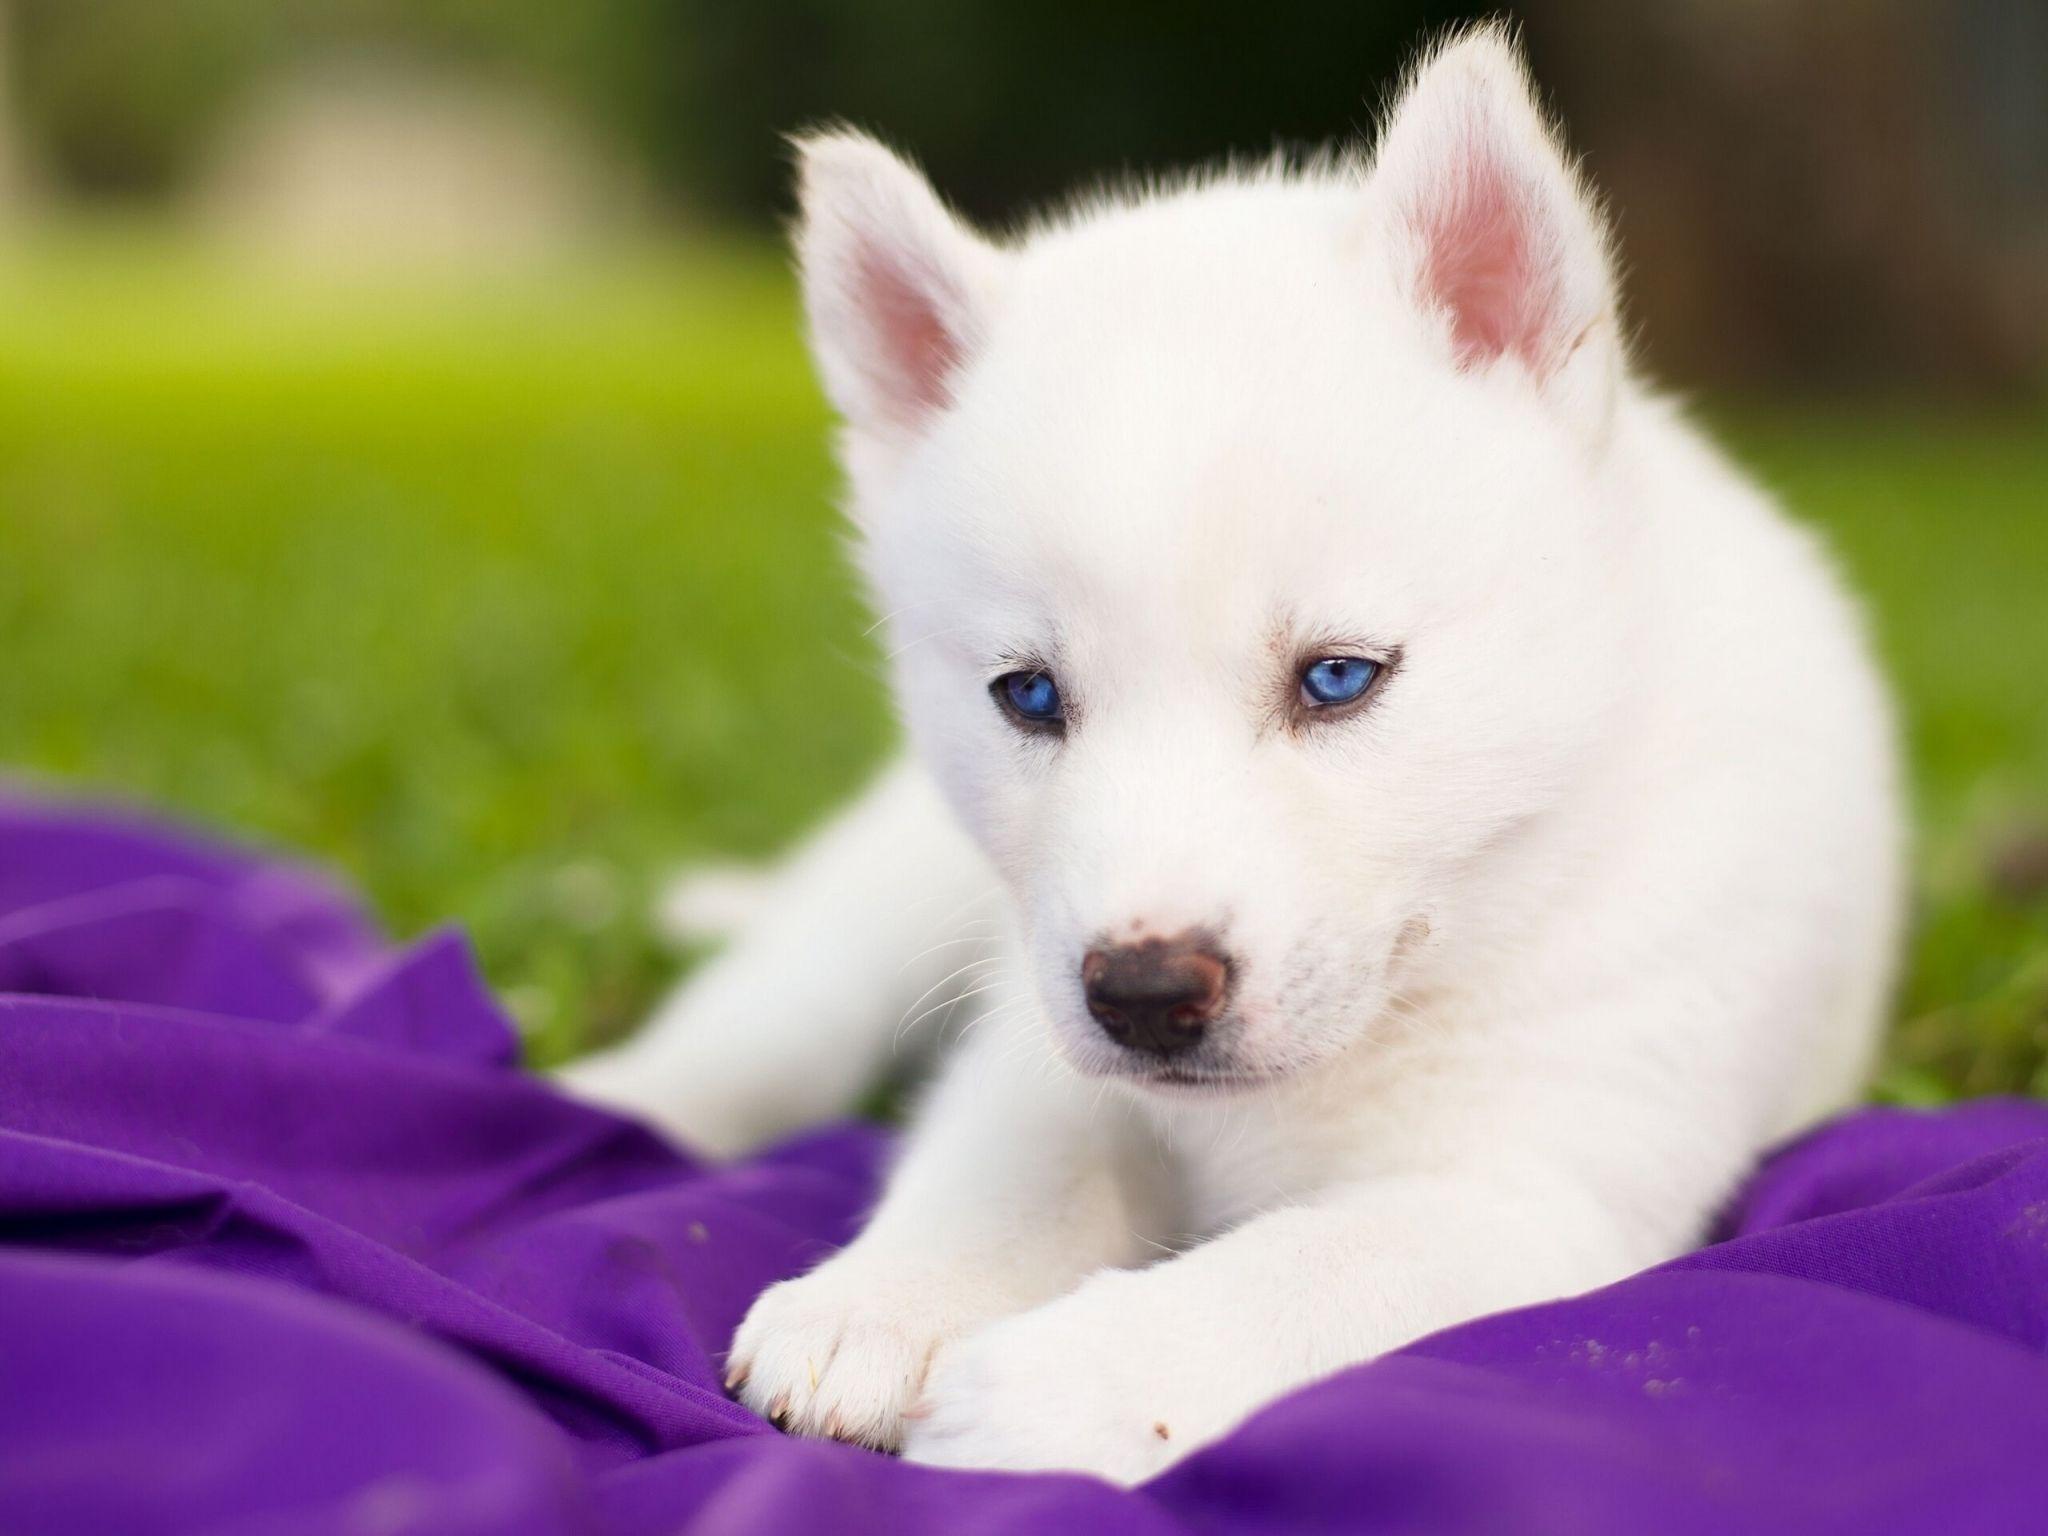 Husky Free Screensaver Wallpapers White Husky Puppy Husky With Blue Eyes Siberian Husky Puppies